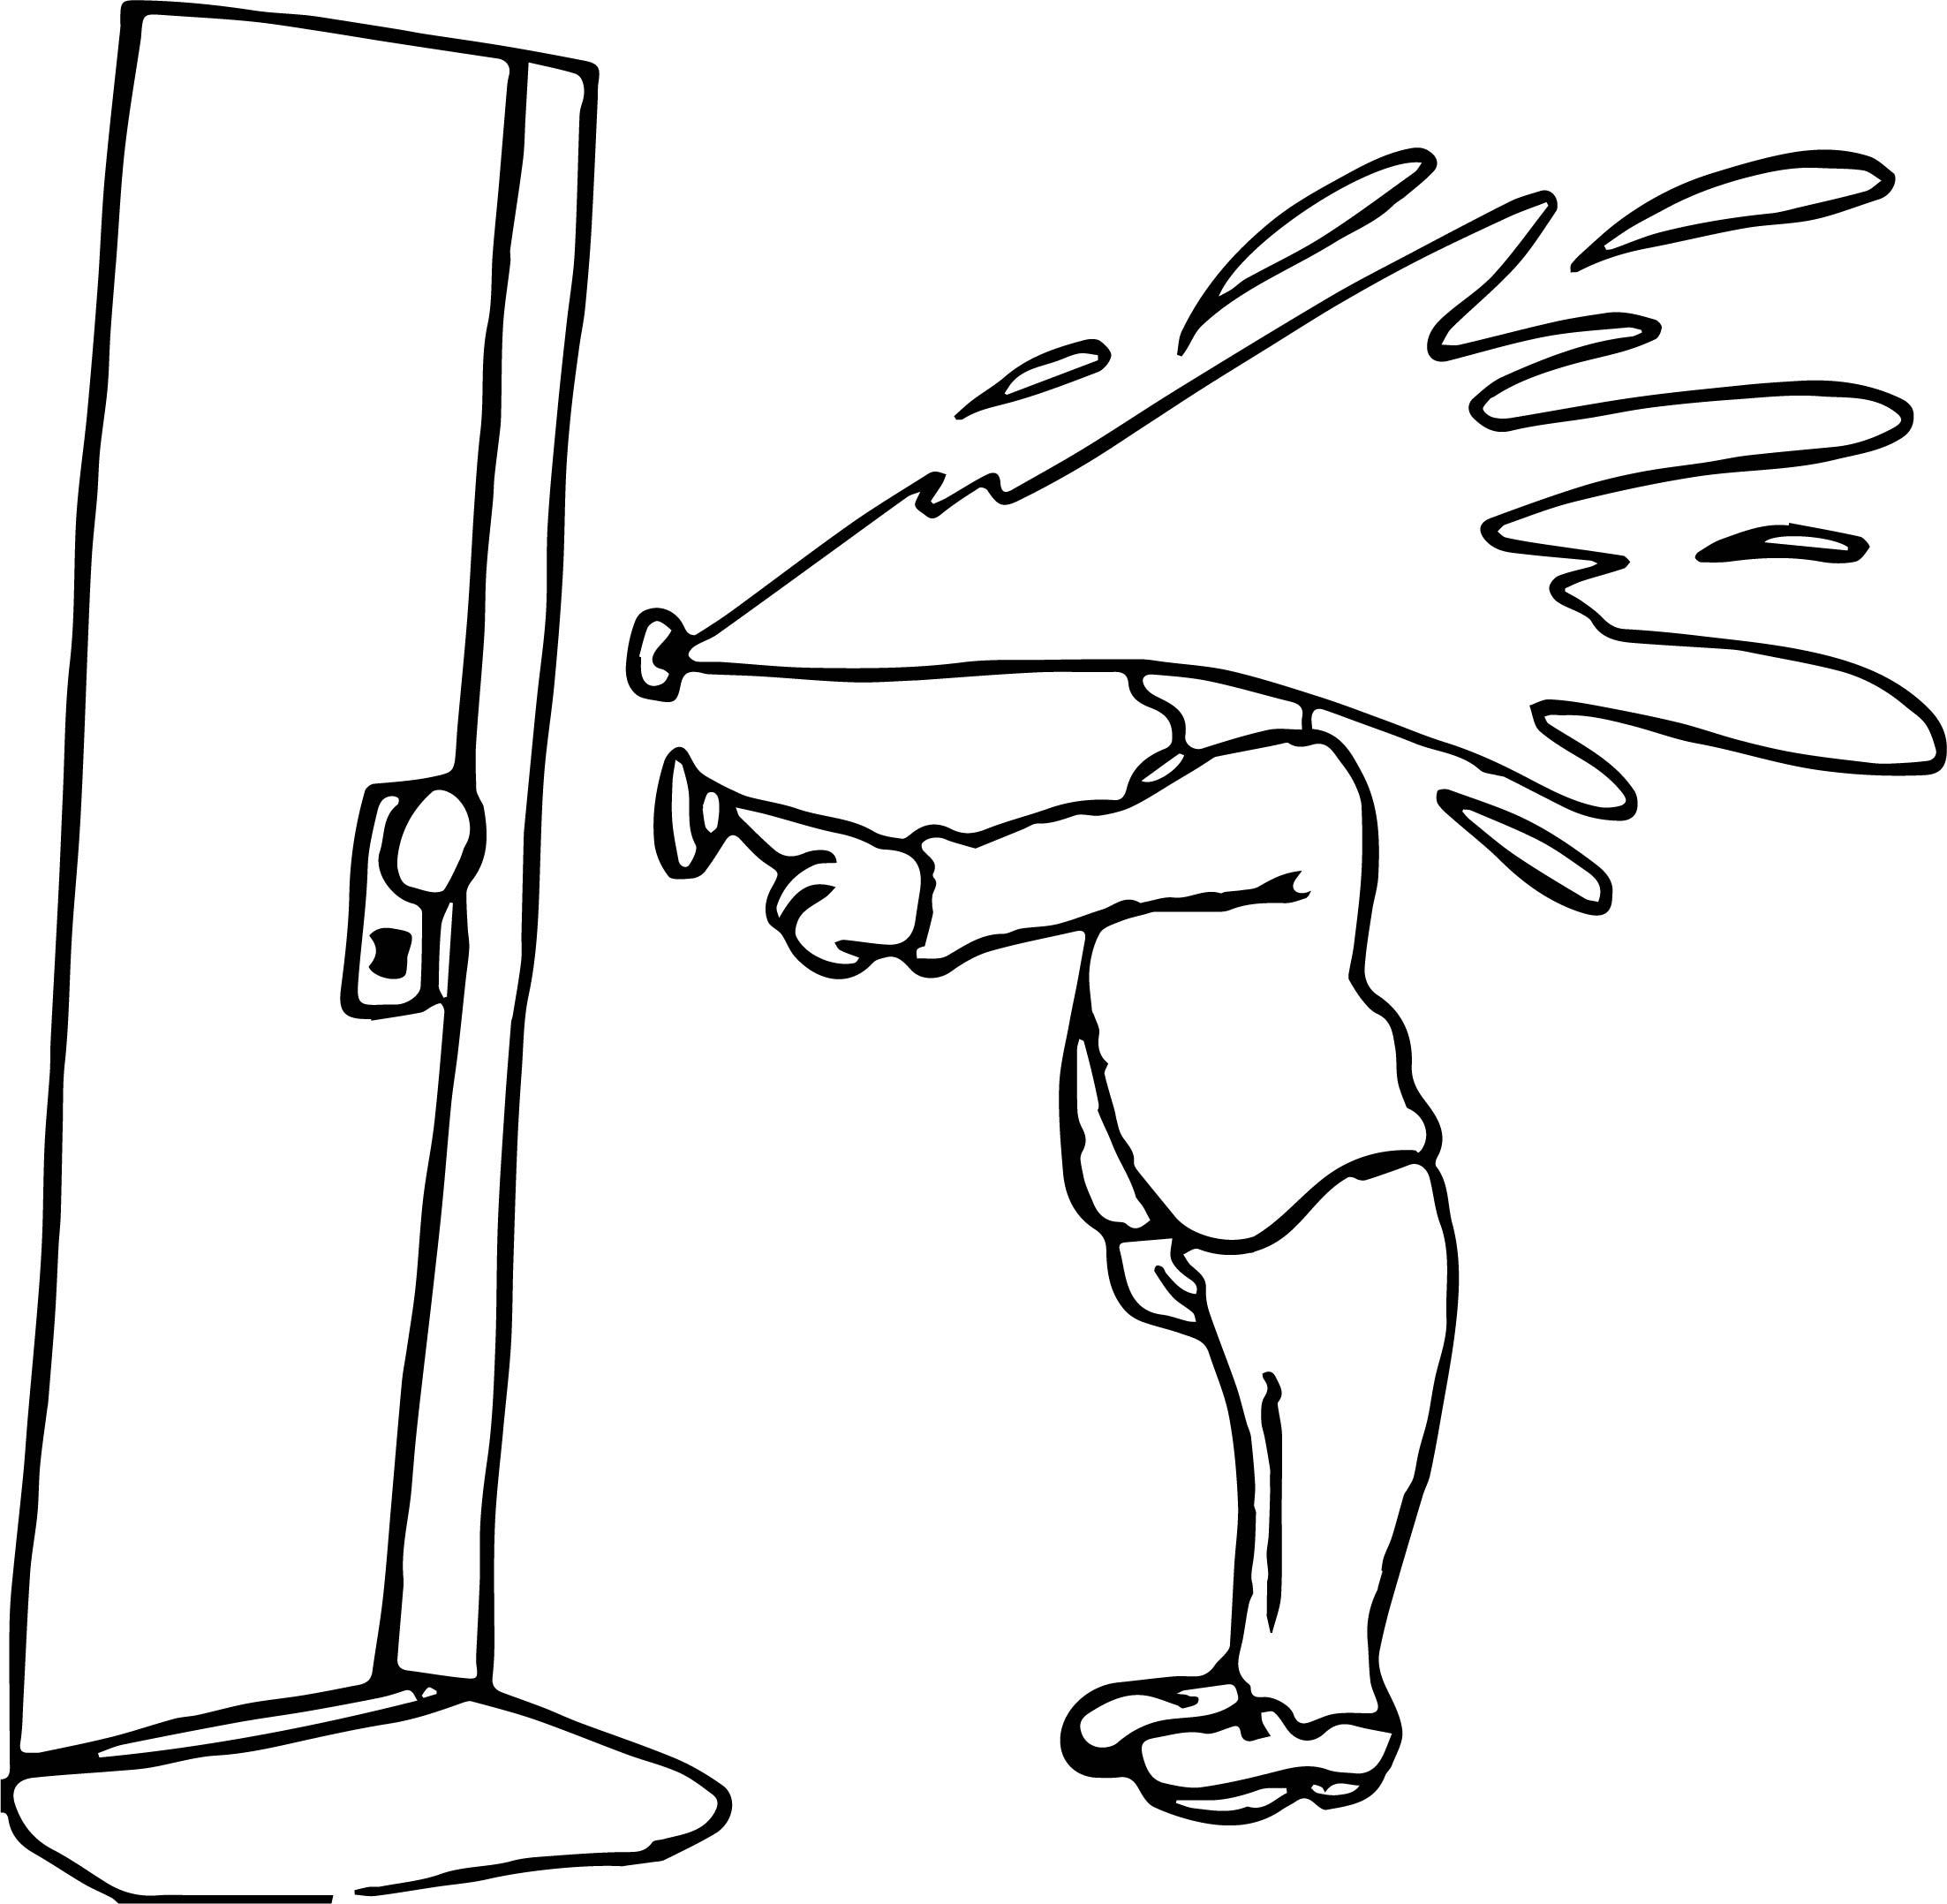 April Fool Door Joke Coloring Page